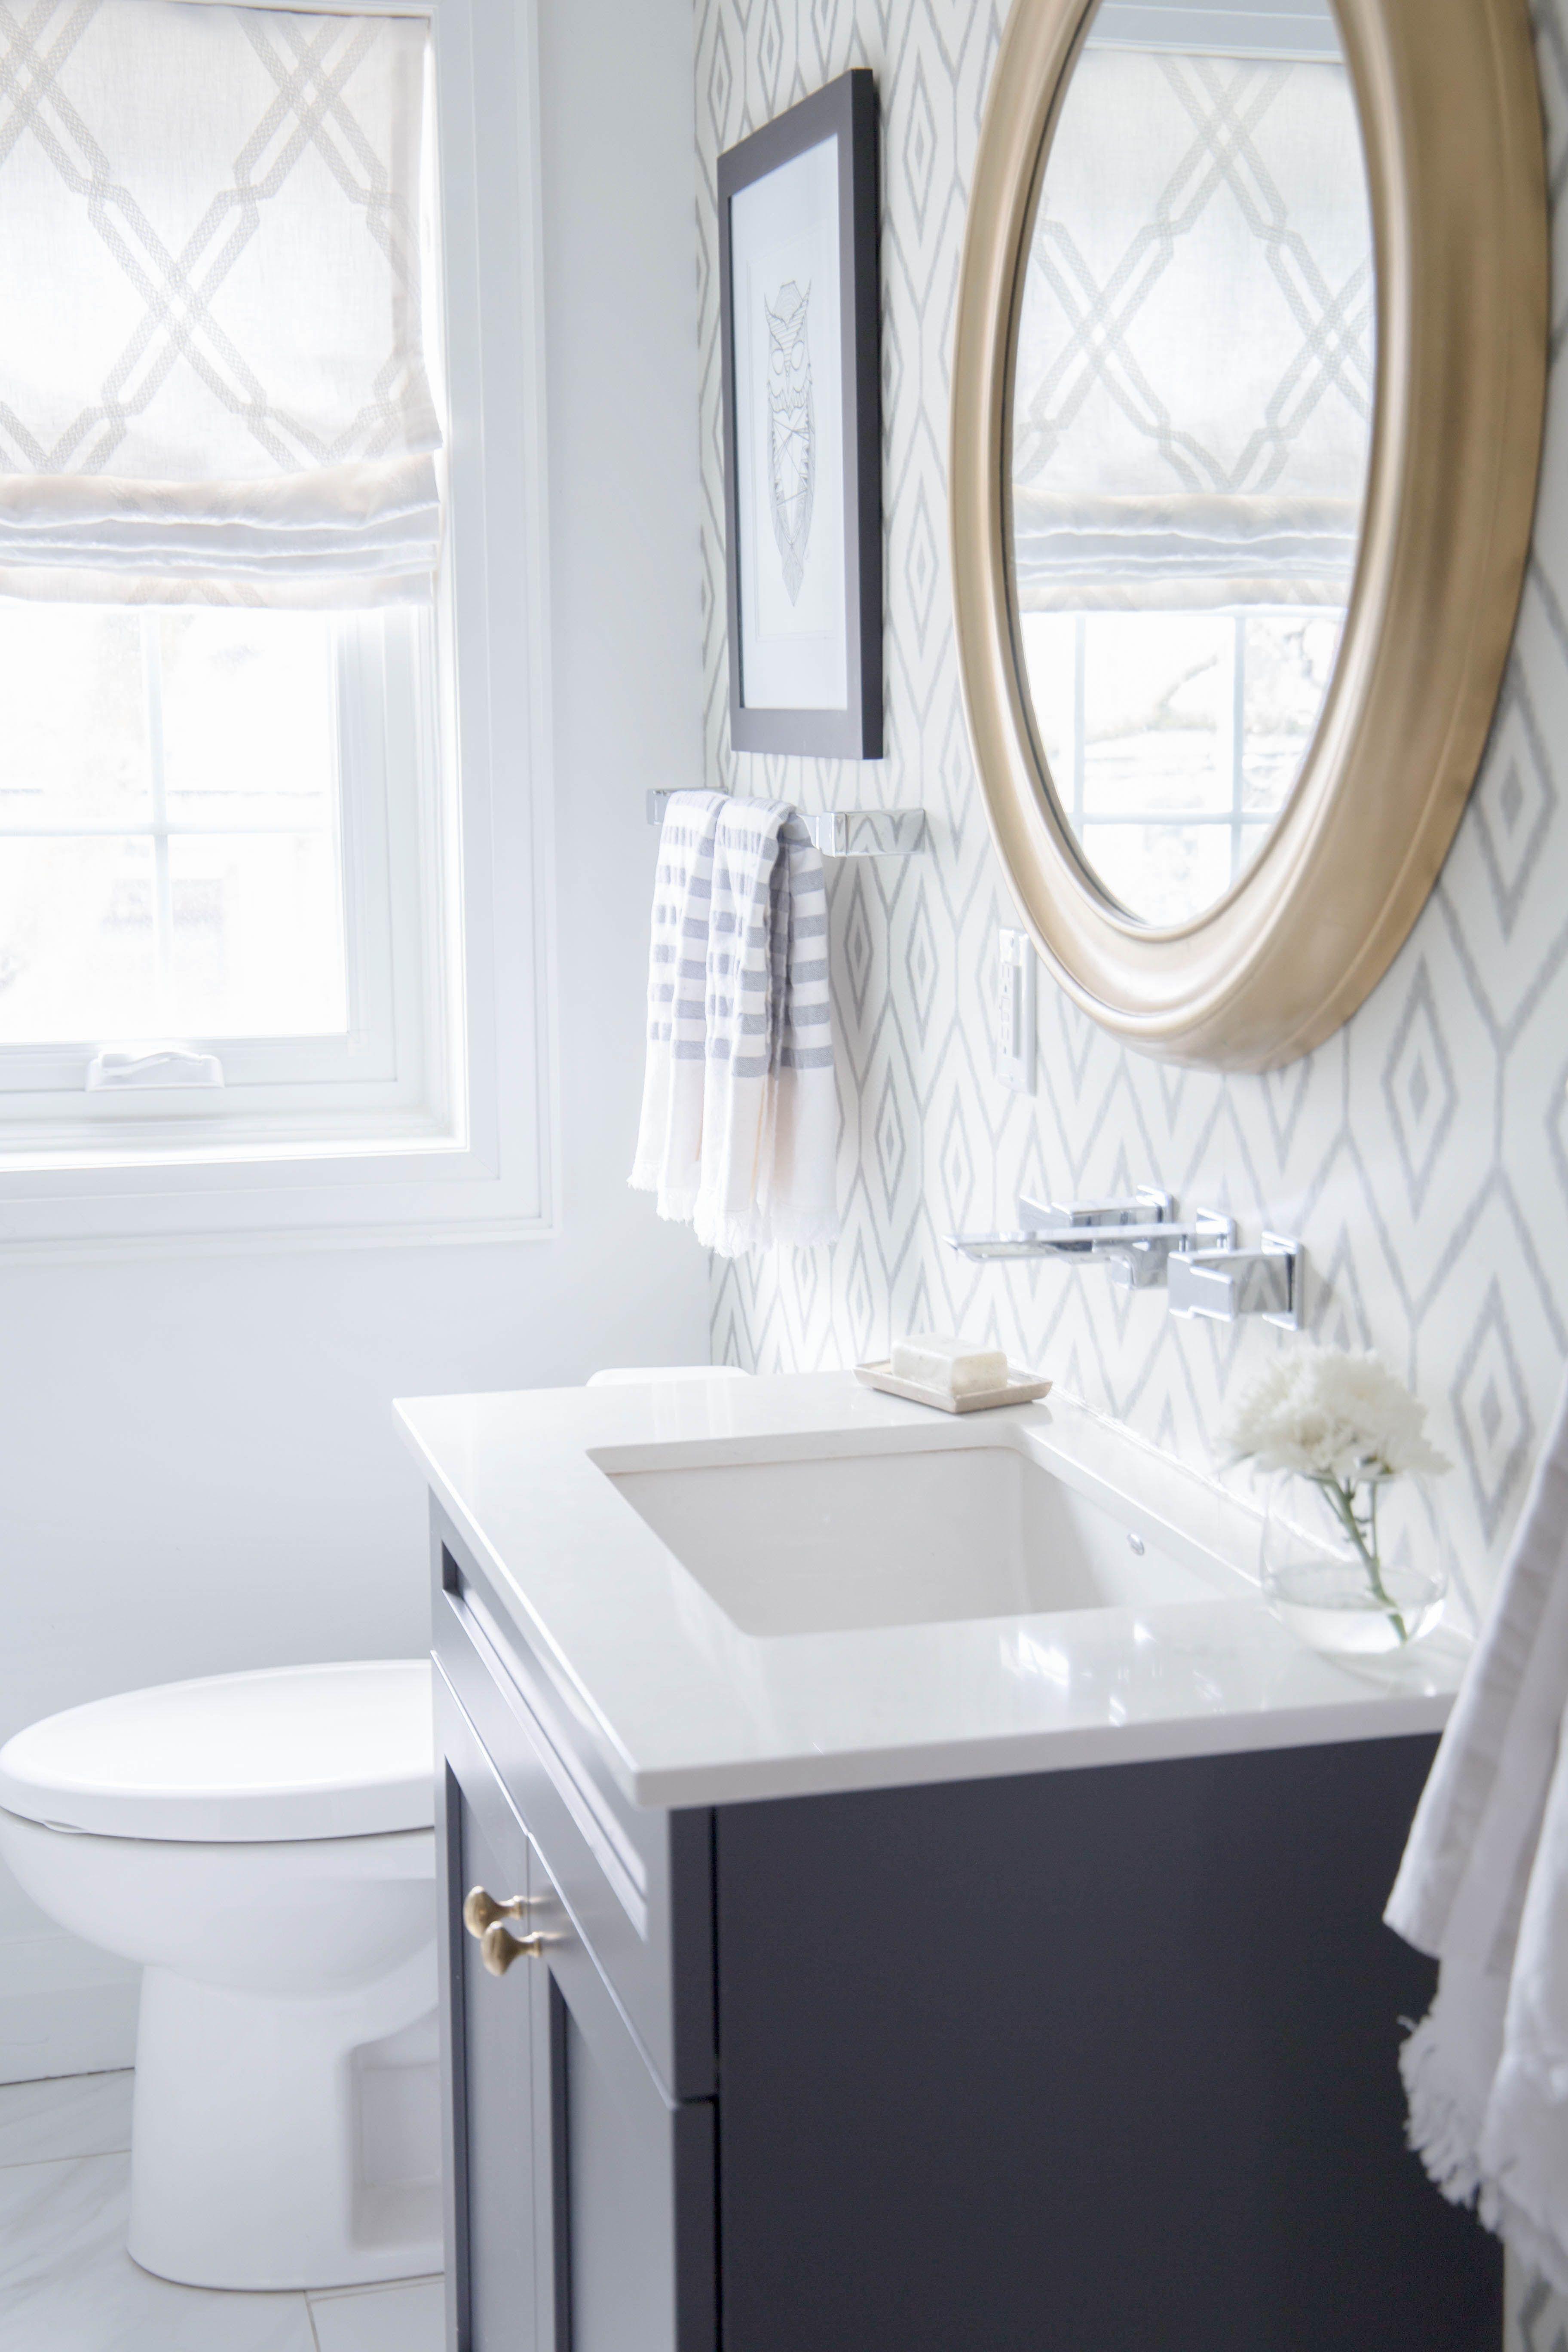 Property Brothers Bathroom Reveal By Karin Bennett Designs Bathroom Brightwhite Clea Bathroom Design Luxury Bathroom Designs India Ensuite Bathroom Designs